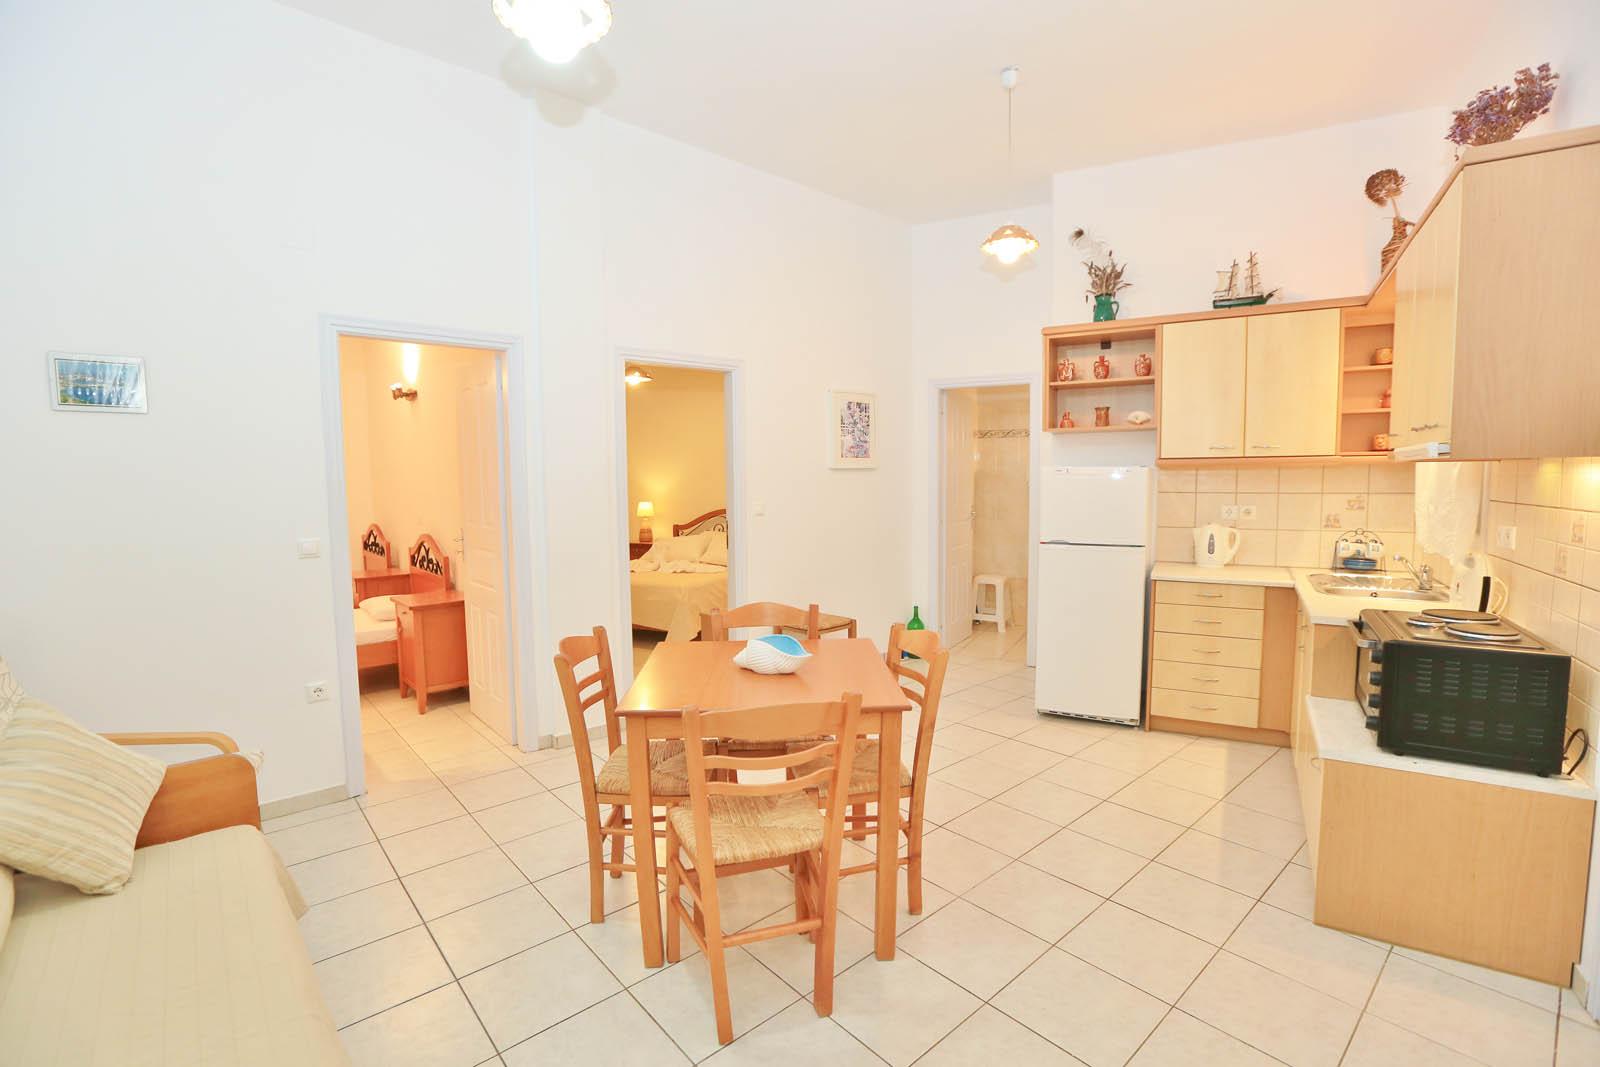 2bedroom apartment (17)